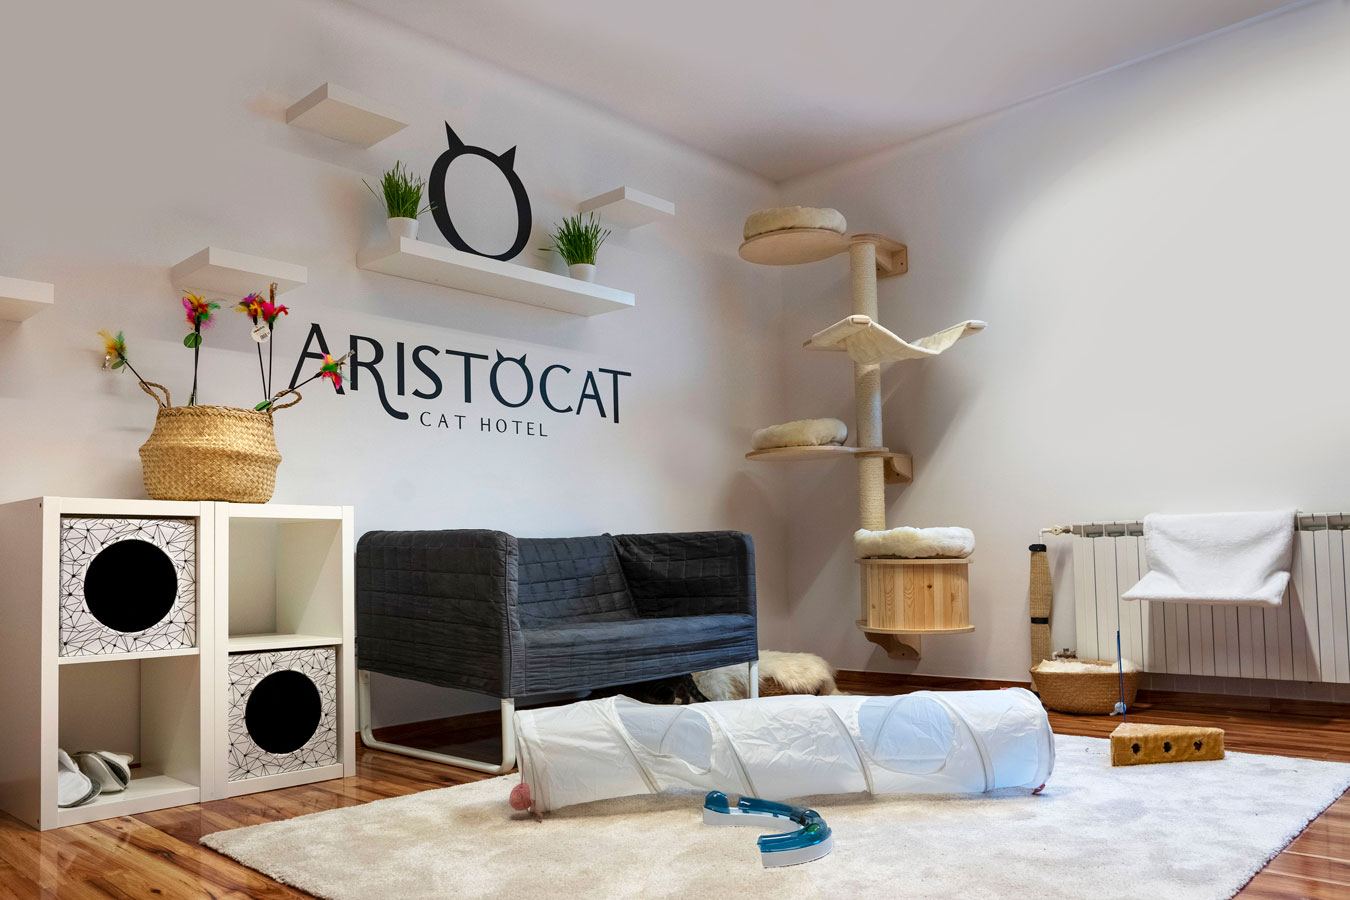 Aristocat single room